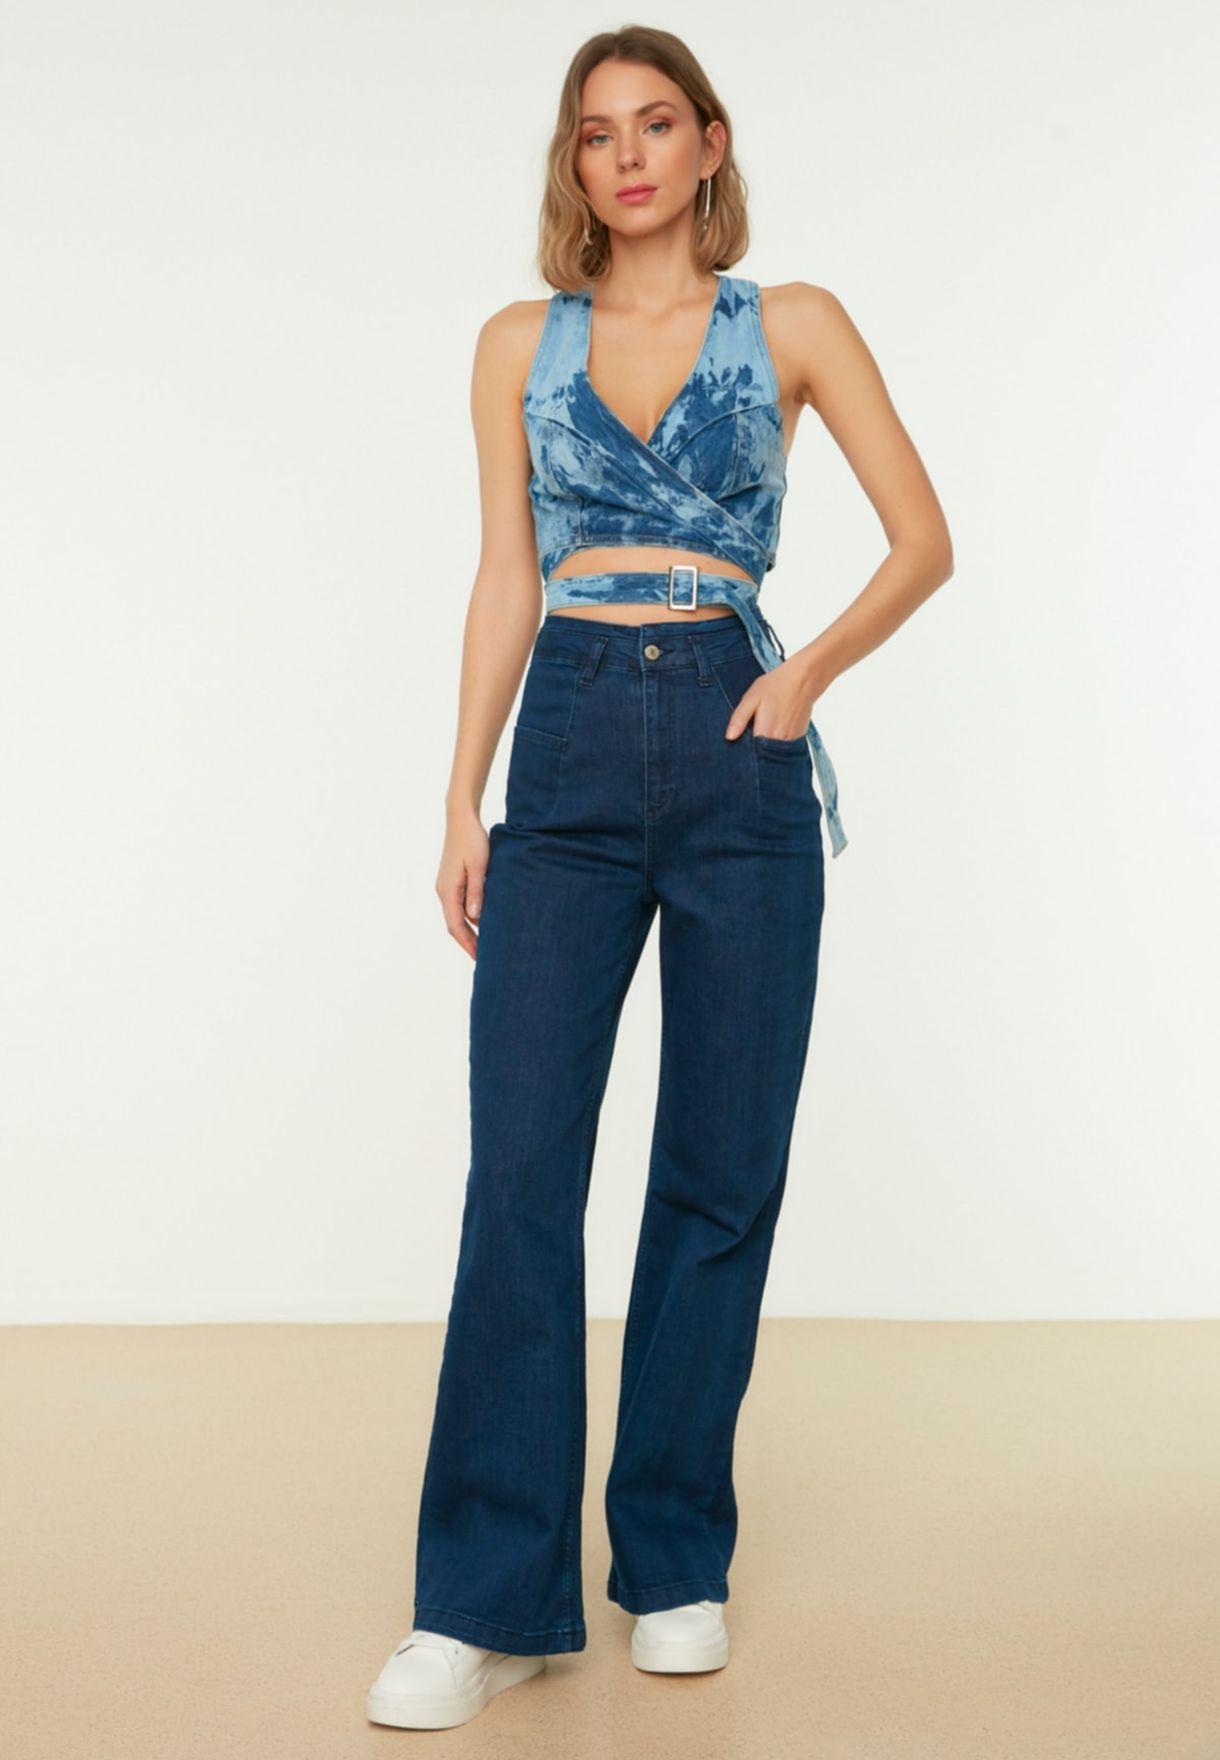 Seam Detail High Waist Jeans